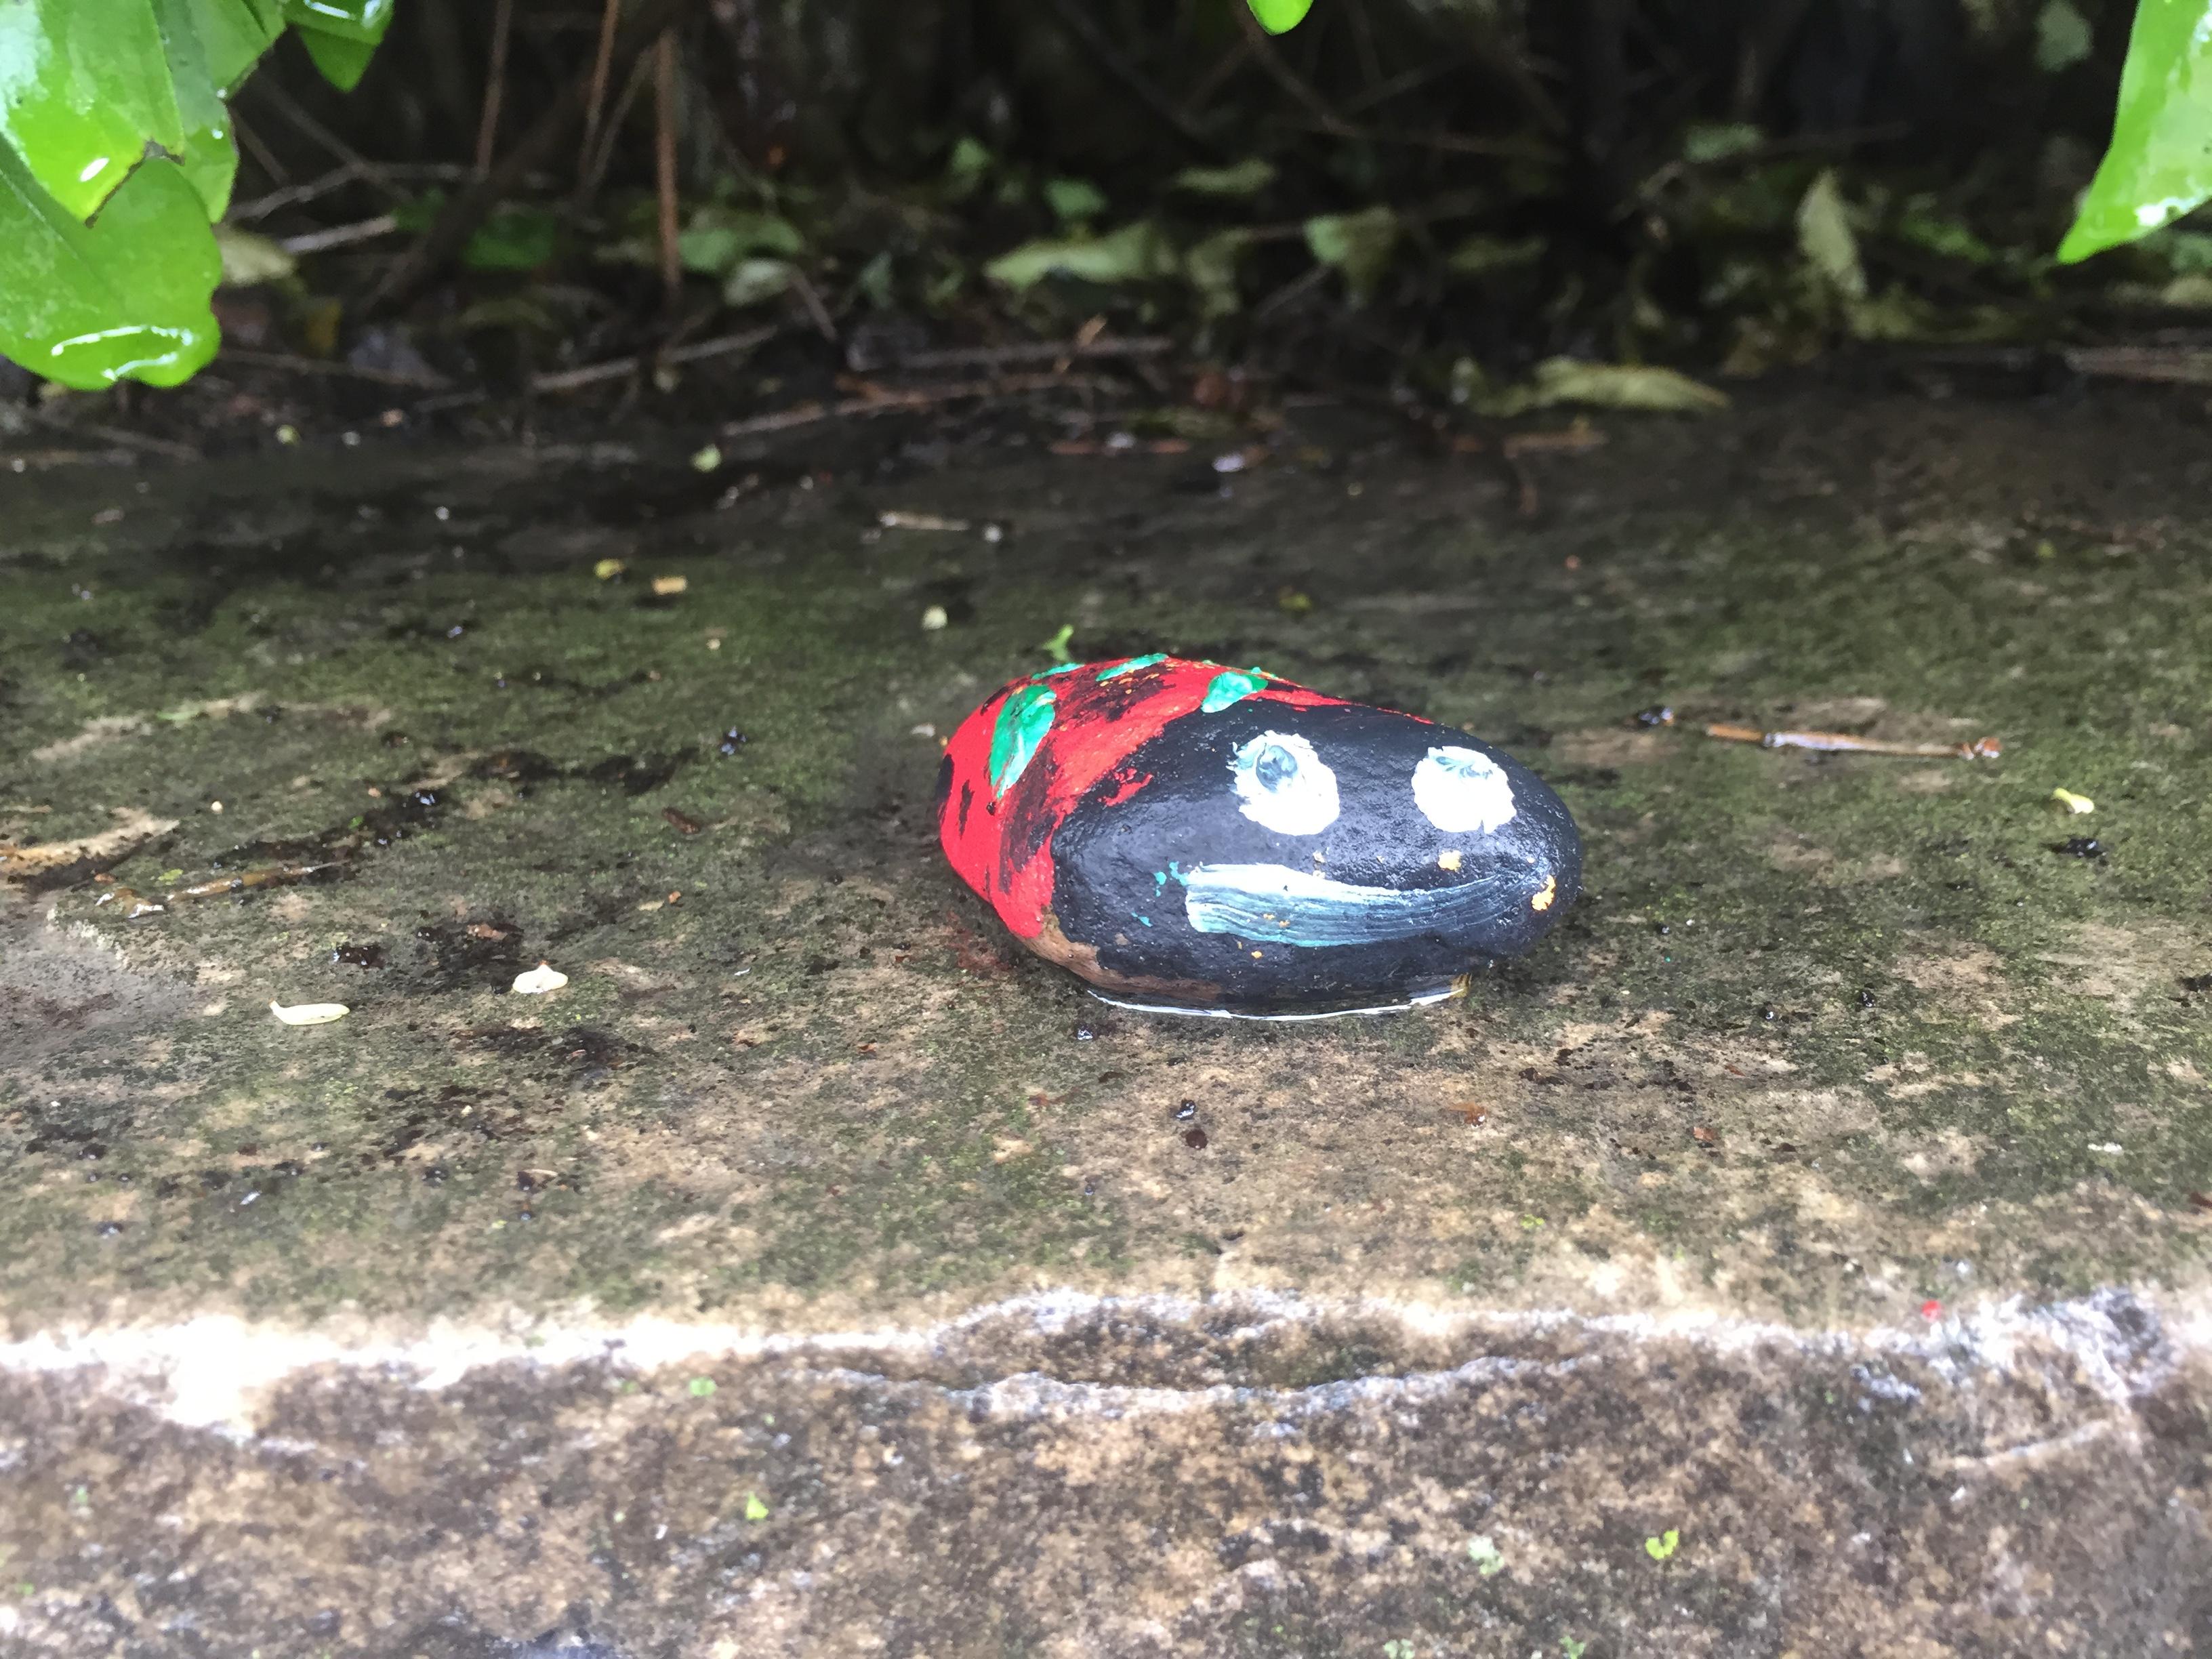 Small rock painted to look like ladybug